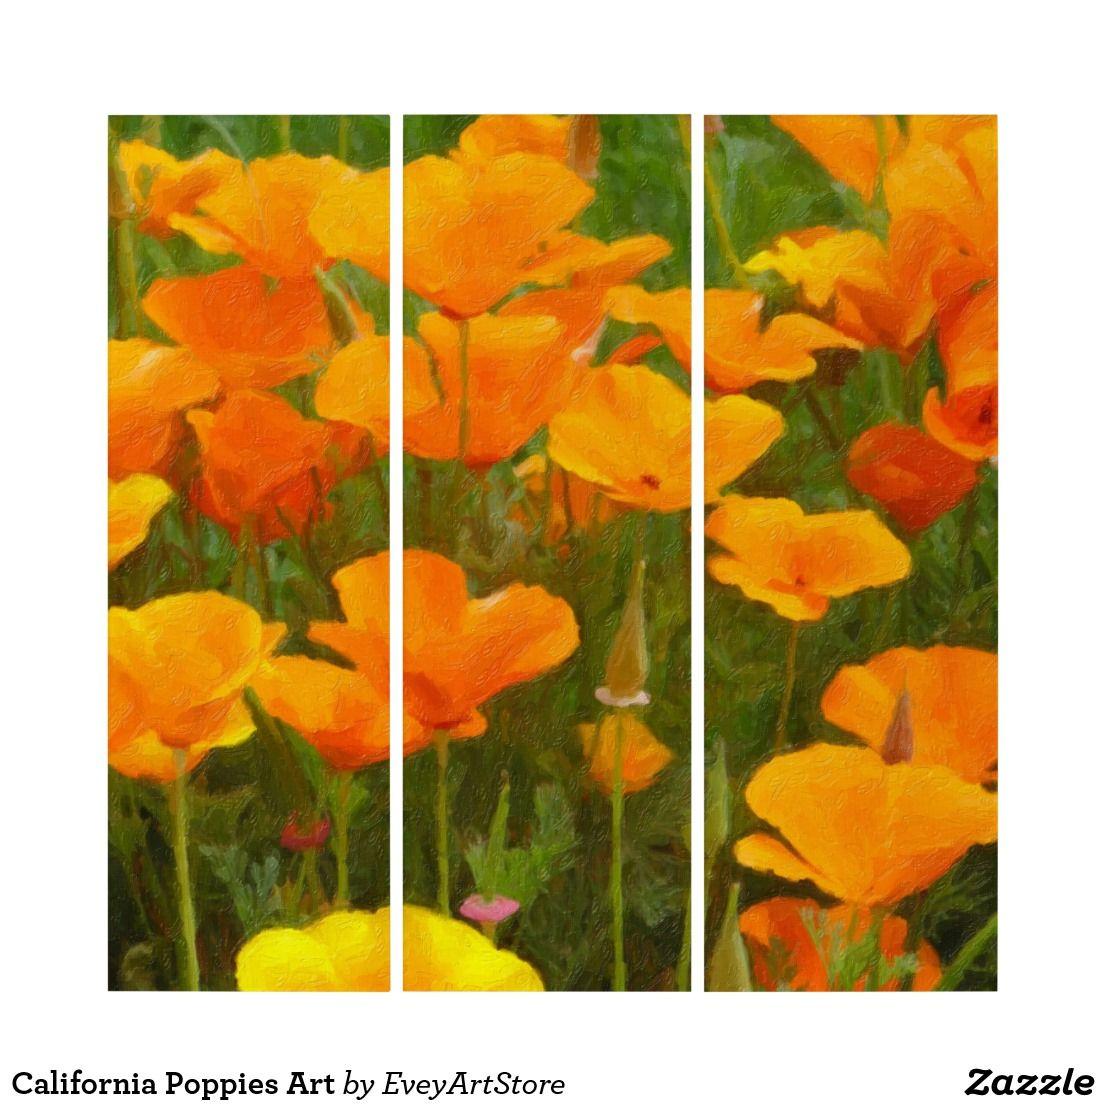 California Poppies Art